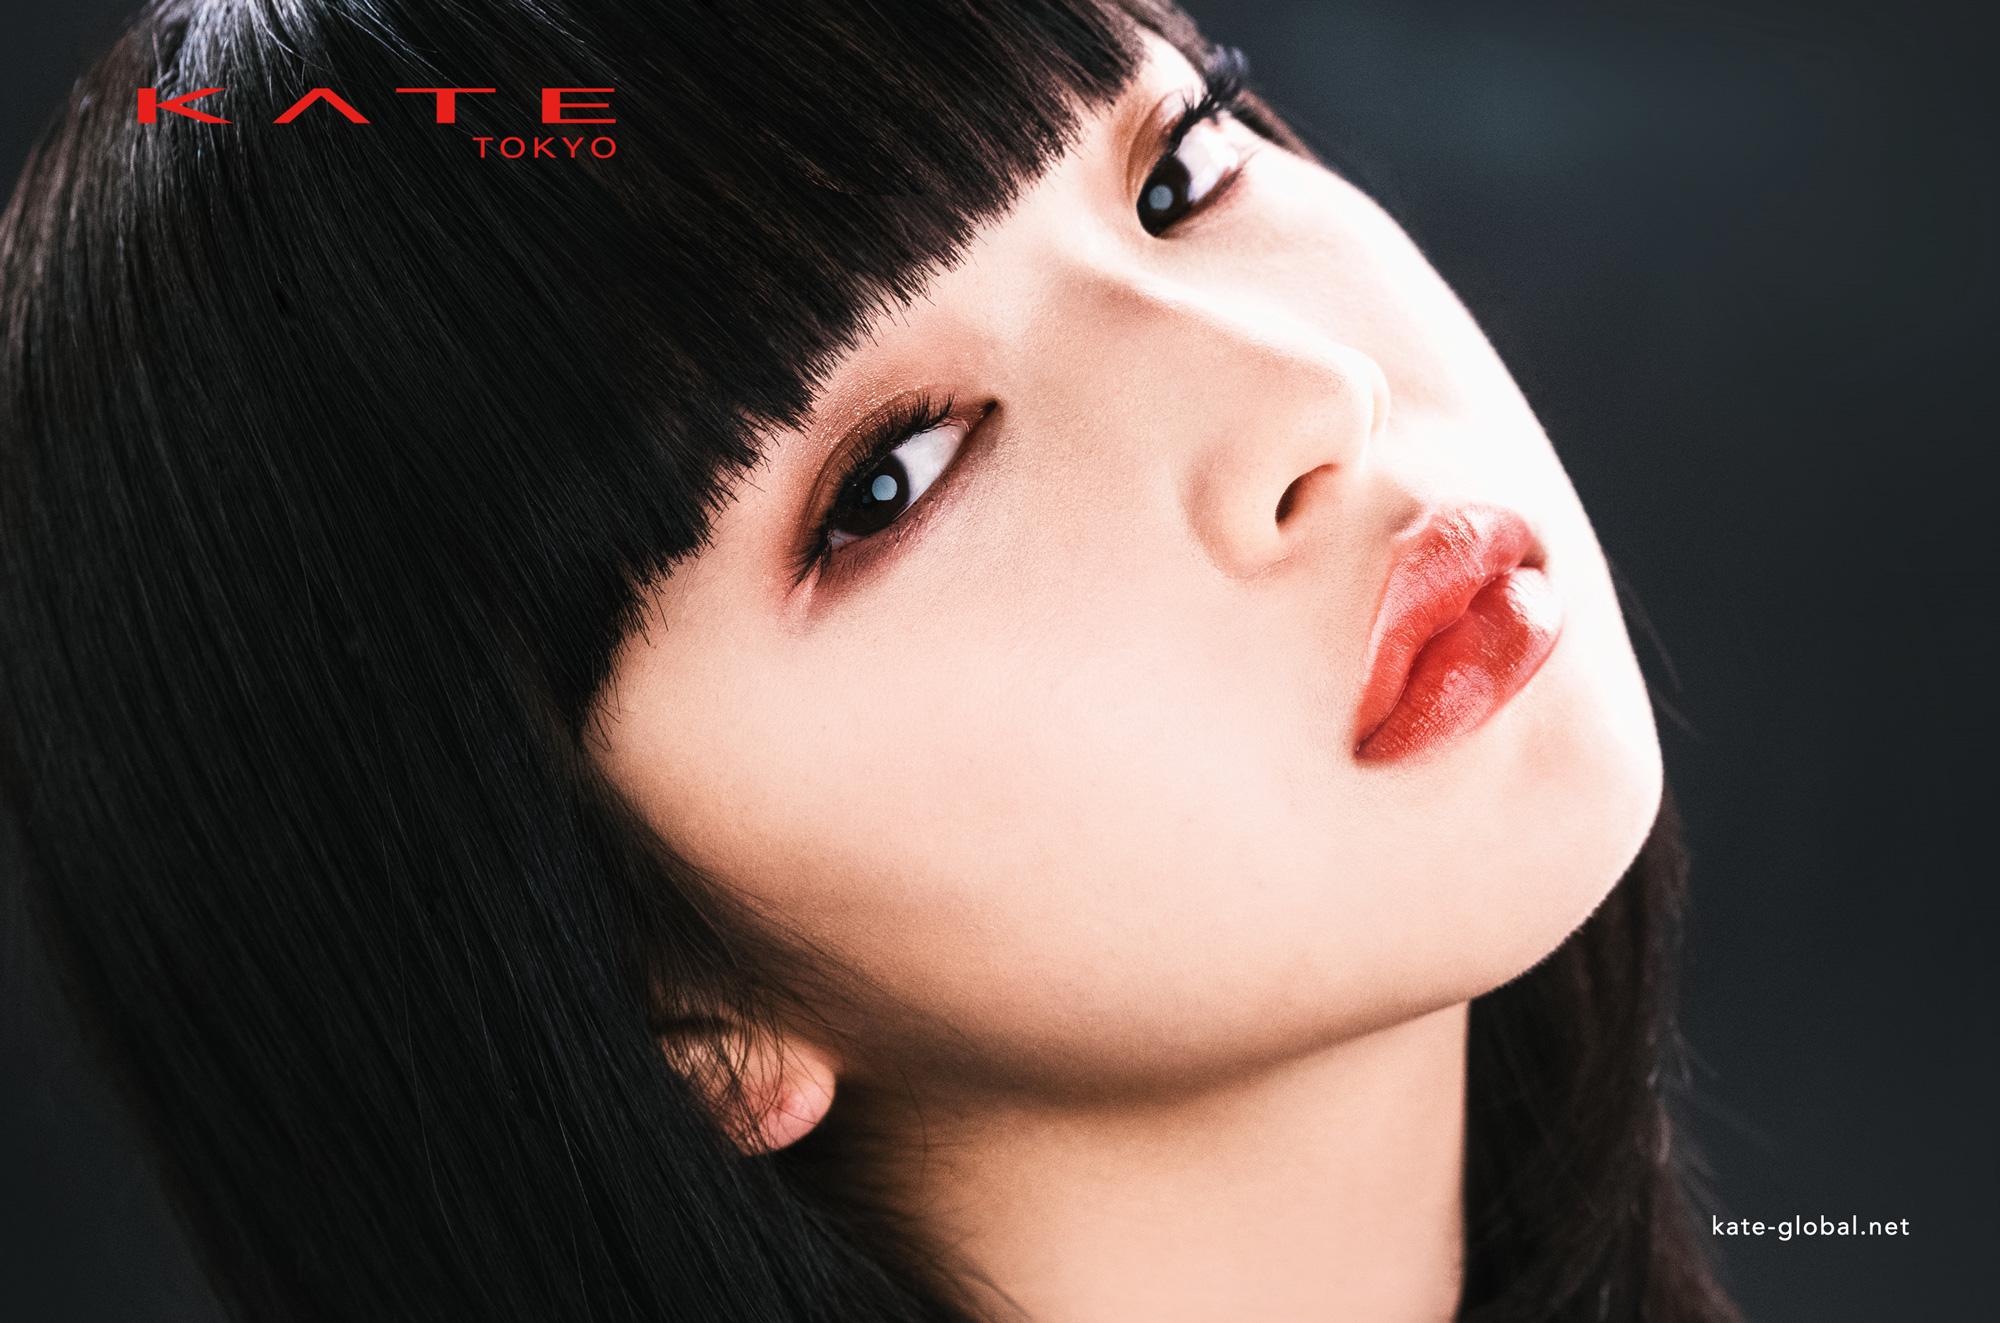 KateTokyo-MeiTanaka-03.jpg